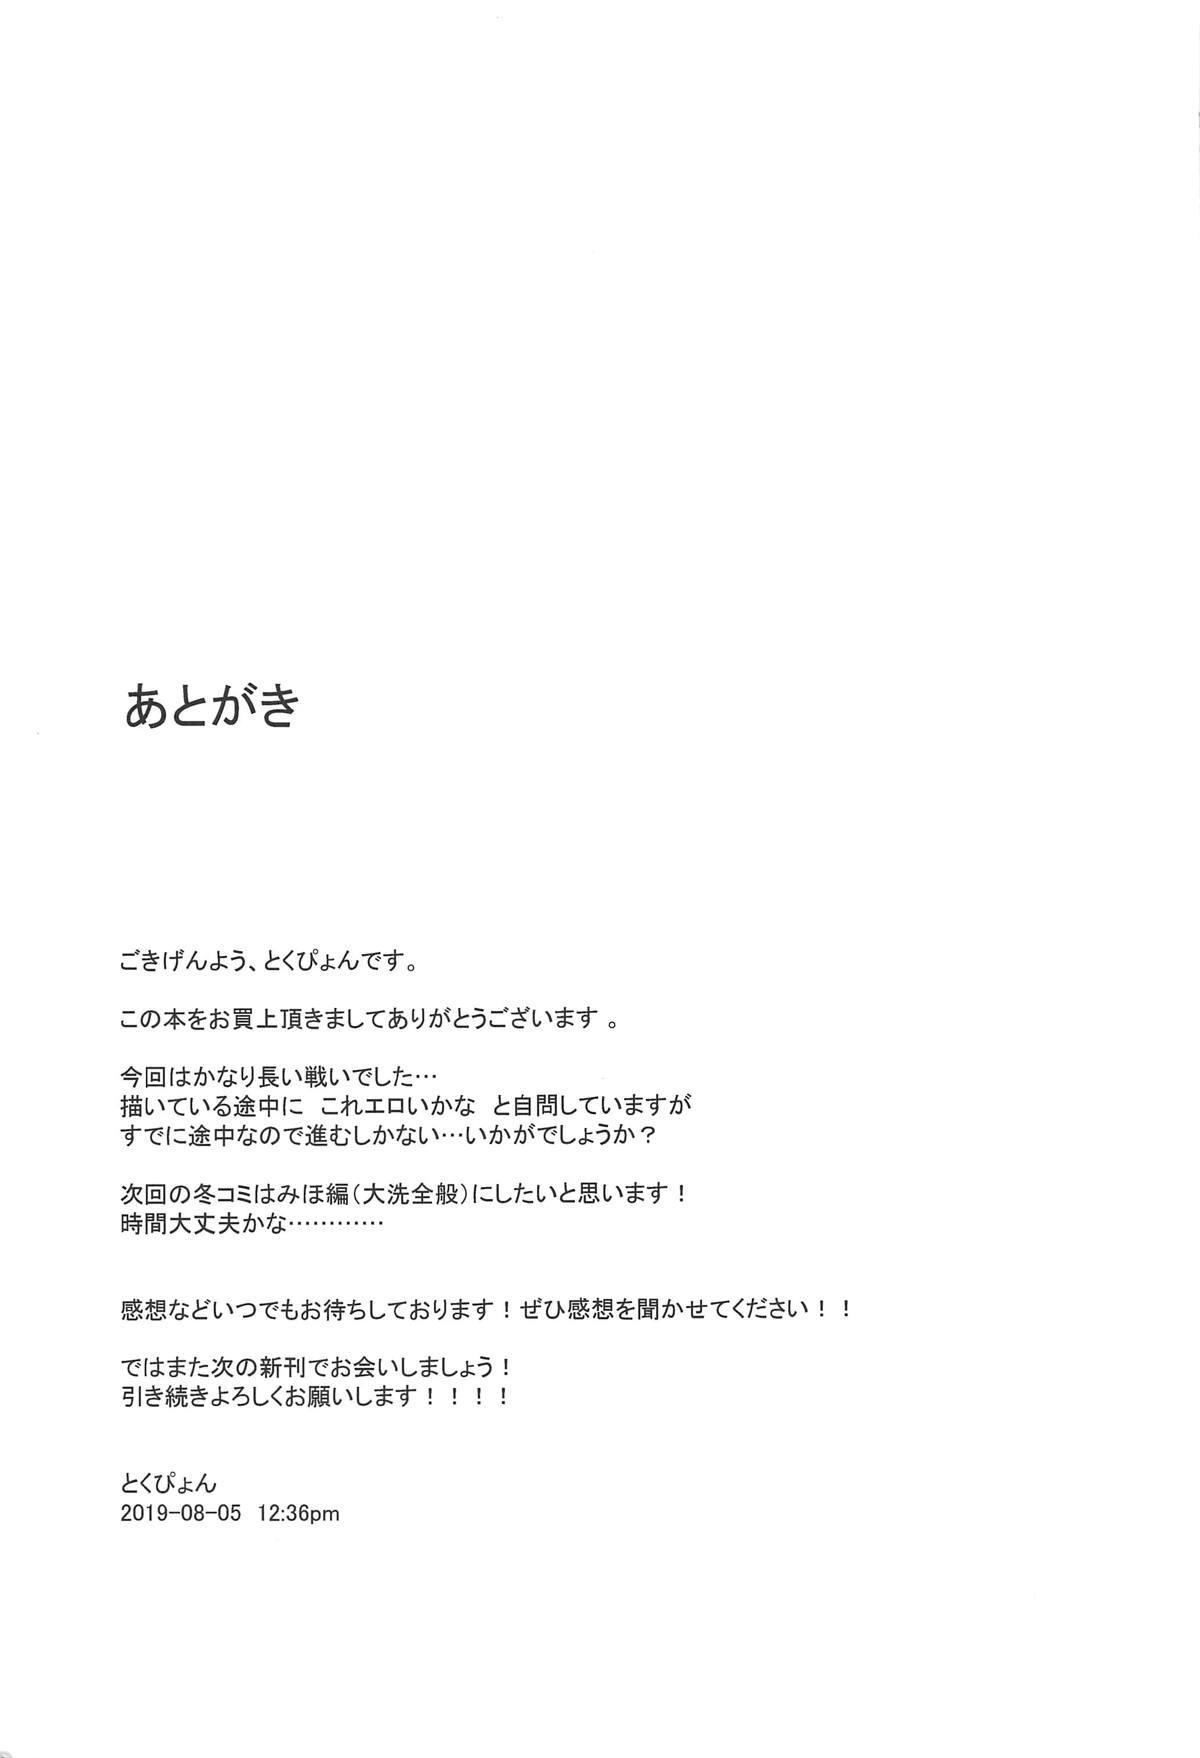 (C96) [chested (Tokupyon)] Nishizumi-ryuu Iemoto no Sodatekata - Maho no Baai Ge (Girls und Panzer) [Chinese] [不咕鸟汉化组] 26